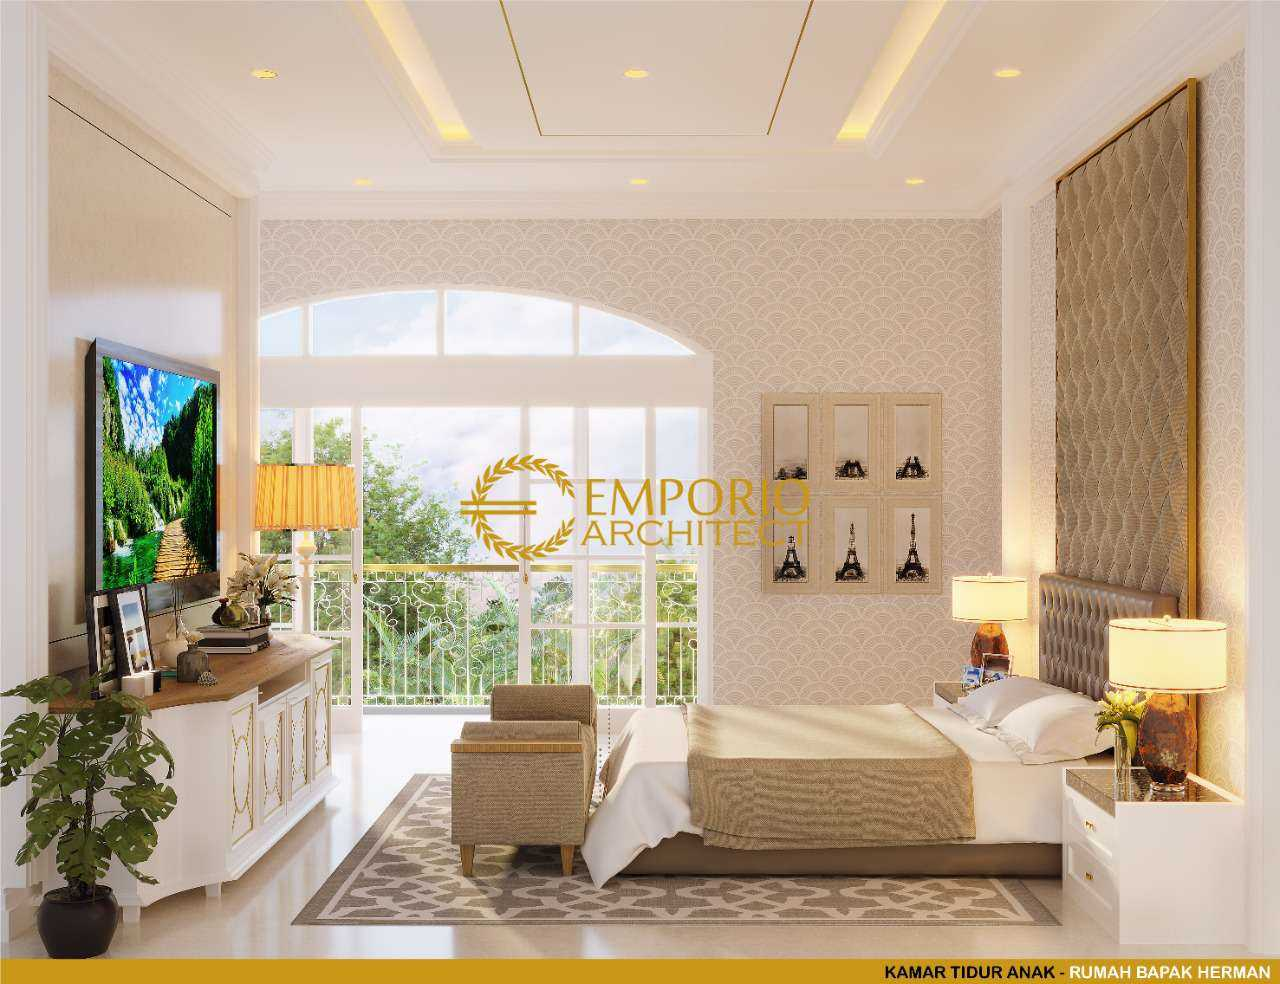 Emporio Architect Jasa Arsitek Denpasar Desain Rumah Classic 3 Lantai 772 @ Denpasar, Bali Kota Denpasar, Bali, Indonesia Kota Denpasar, Bali, Indonesia Emporio-Architect-Jasa-Arsitek-Denpasar-Desain-Rumah-Classic-3-Lantai-772-Denpasar-Bali  88081